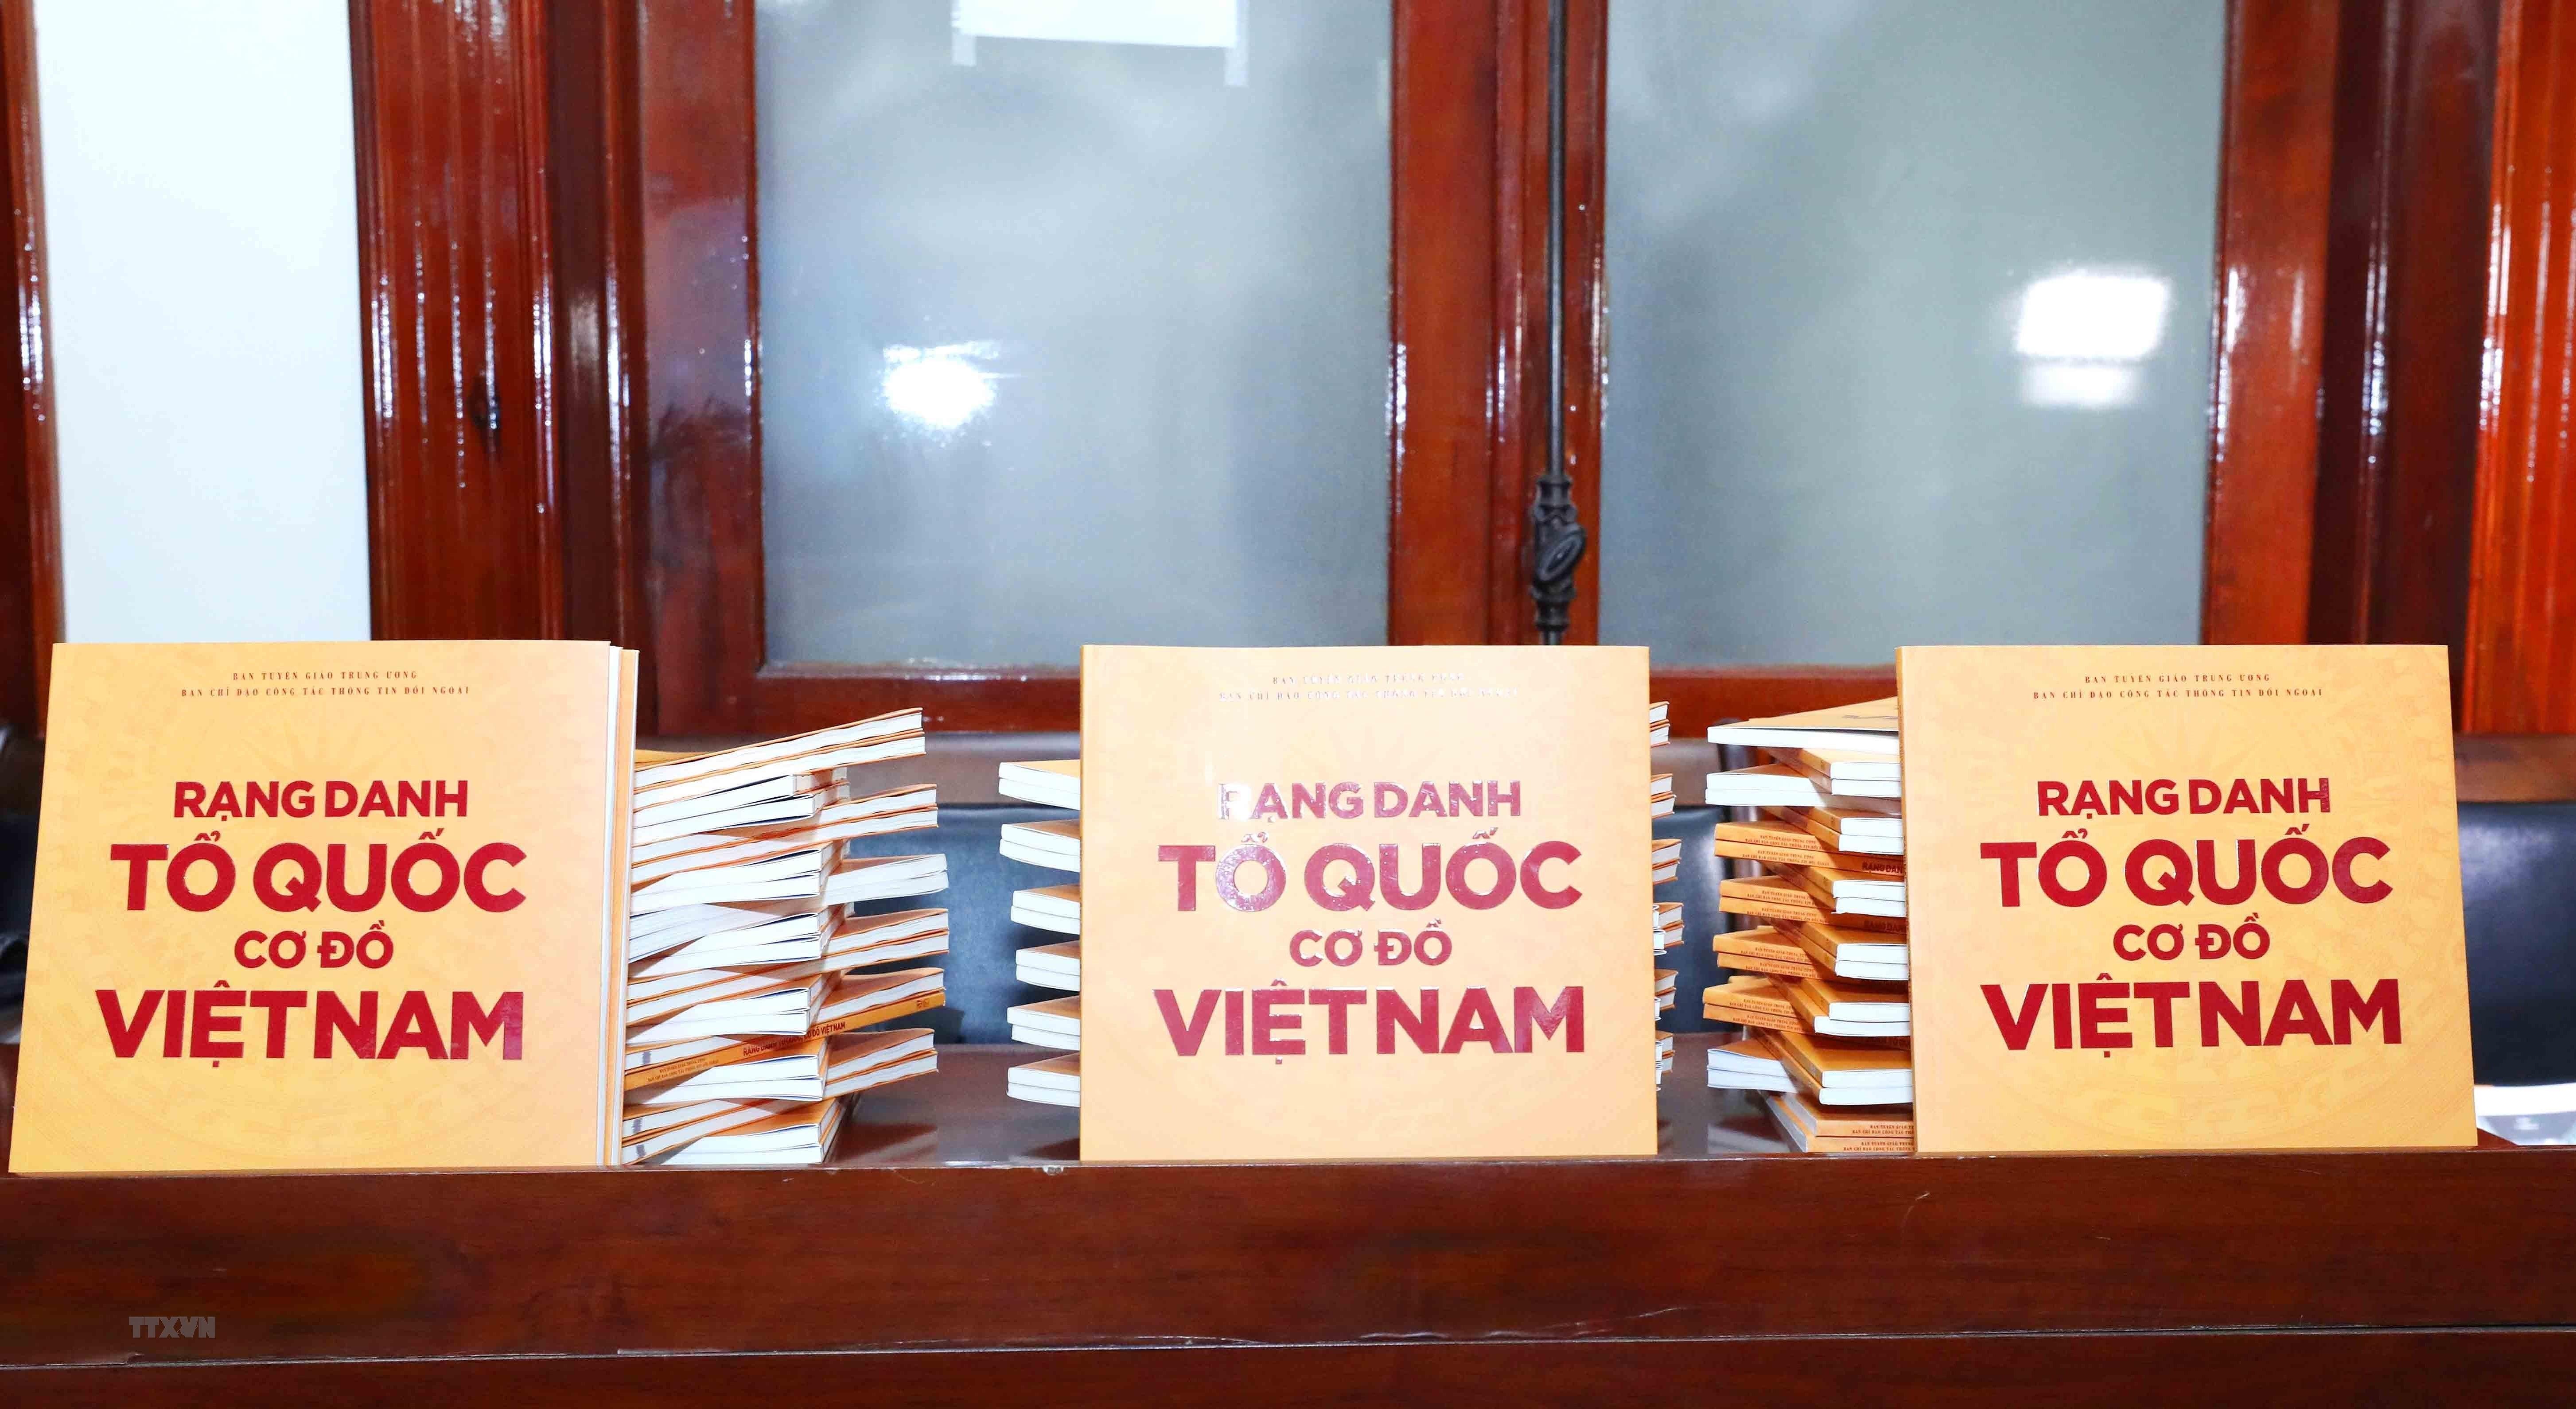 Dai hoi XIII cua Dang: Khai truong Trang Thong tin doi ngoai dien tu hinh anh 2